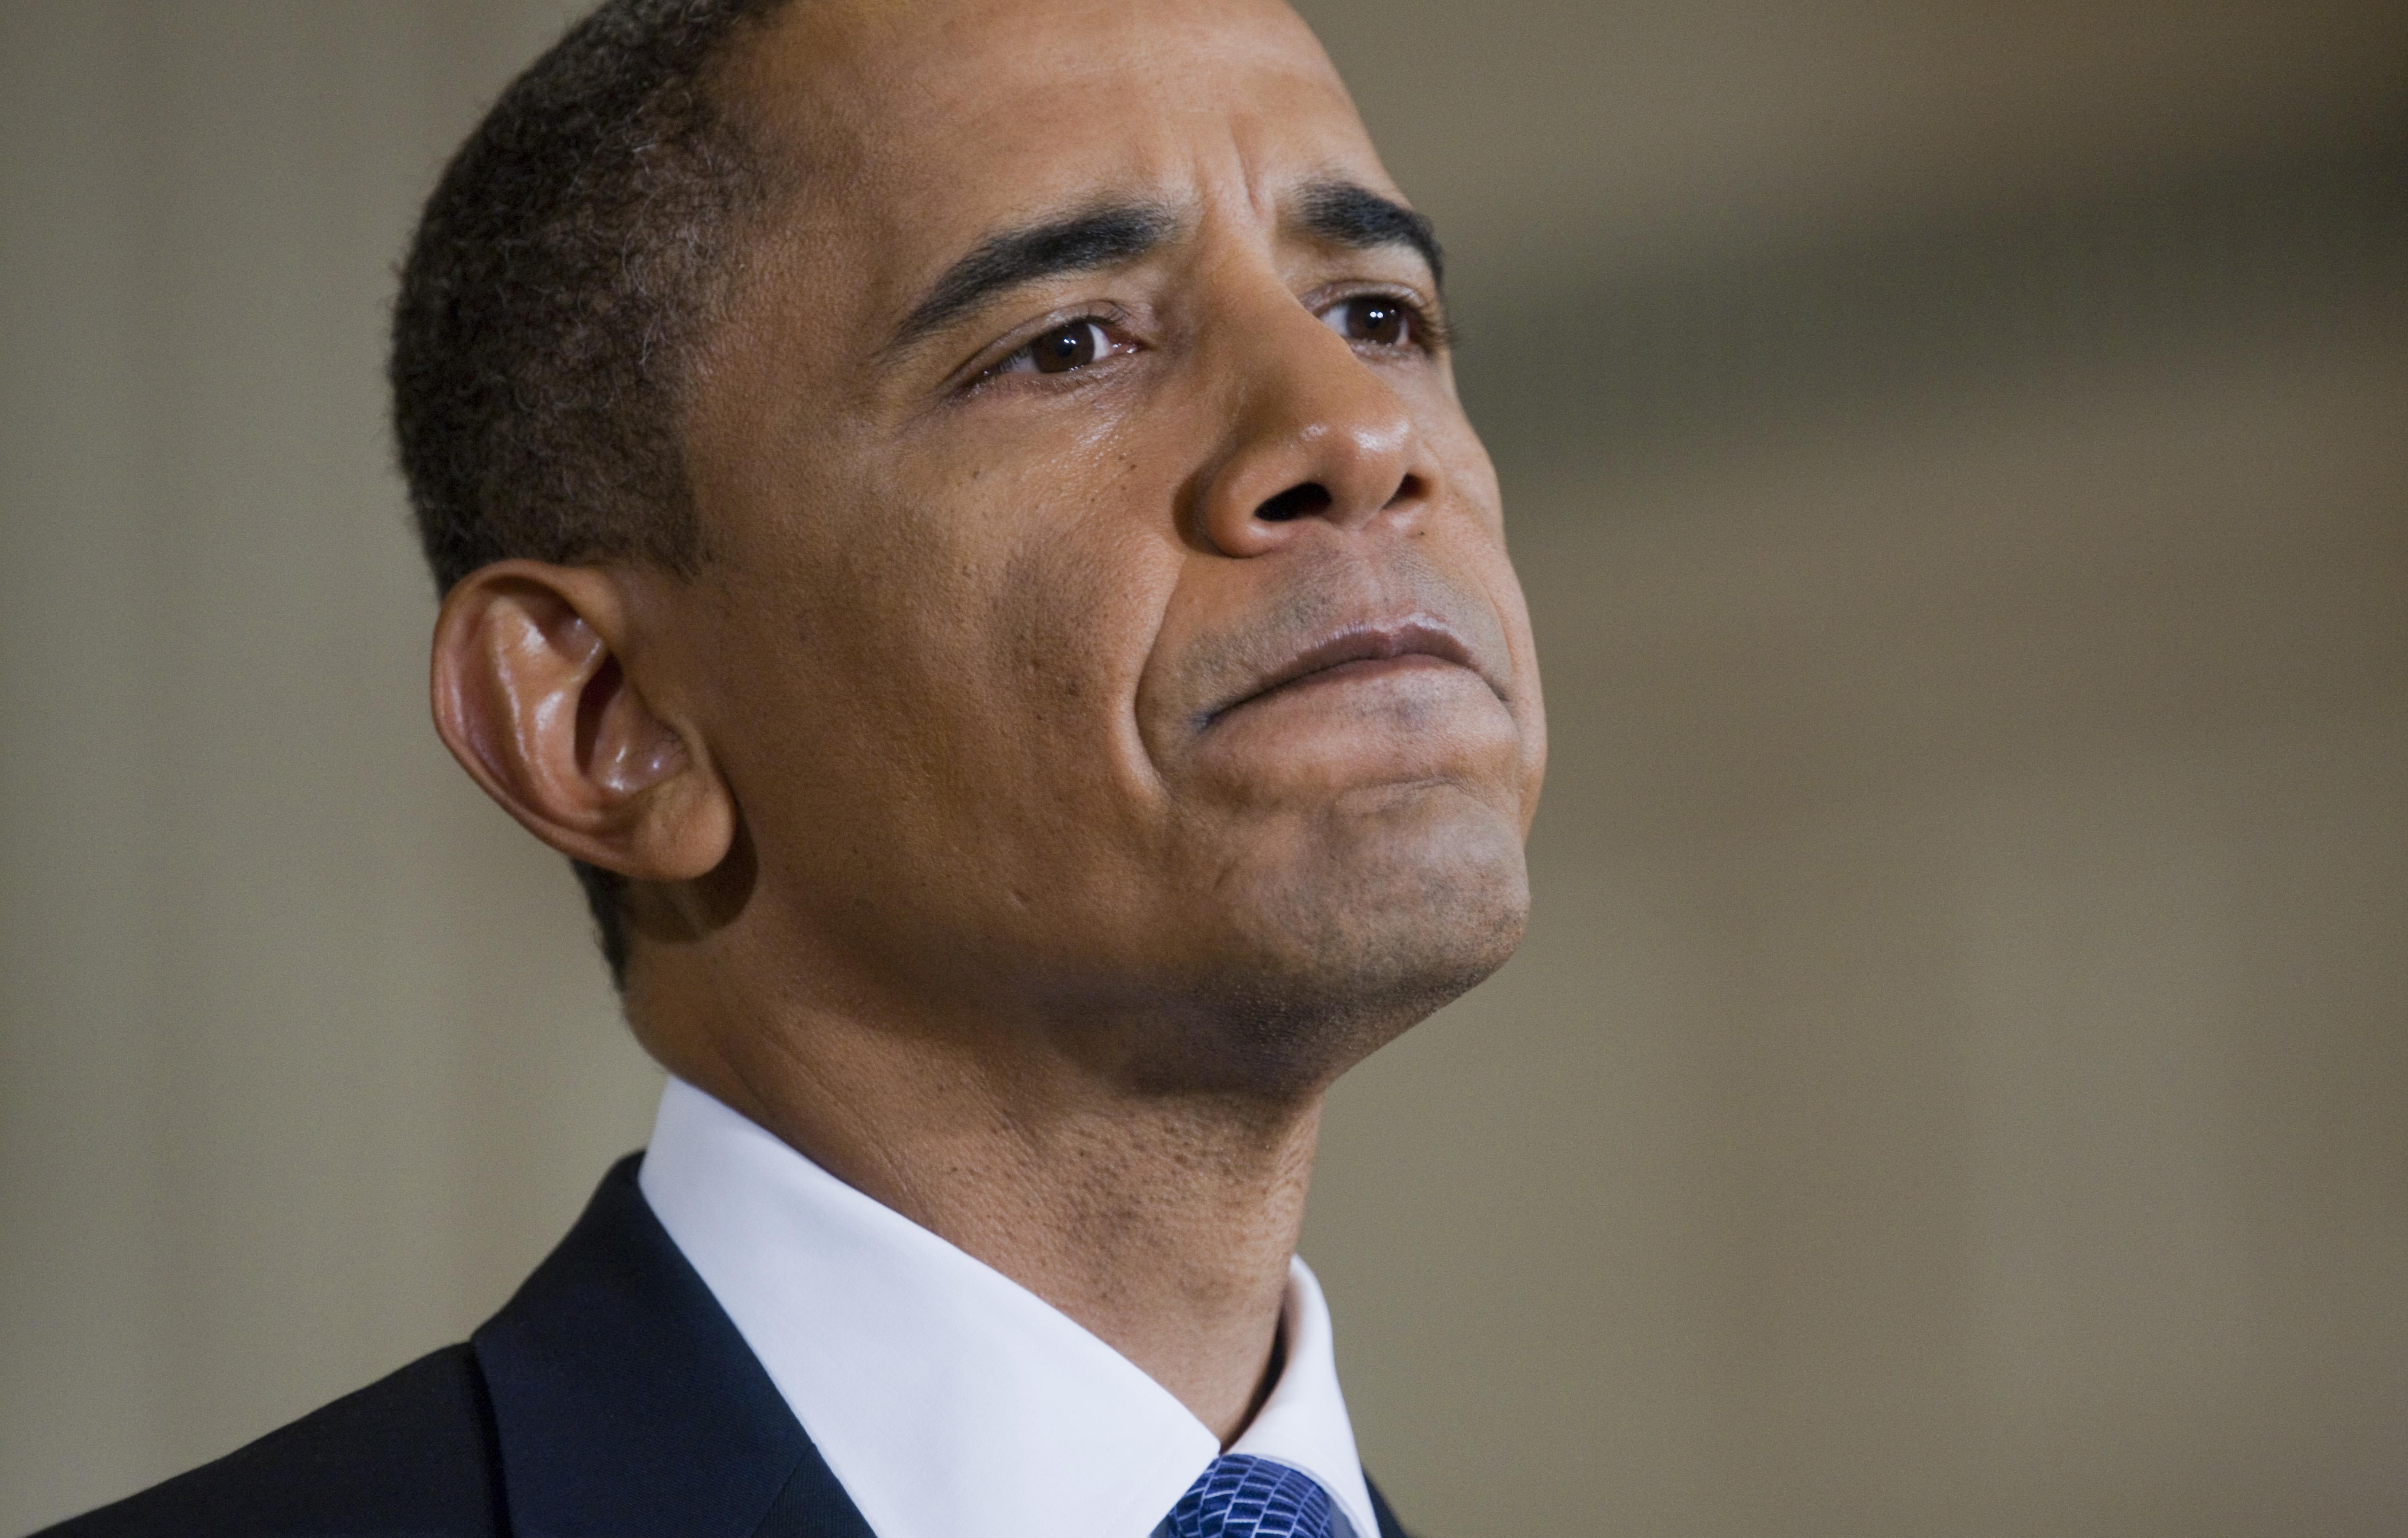 USA - Politics - President Barack Obama Holds News Conference